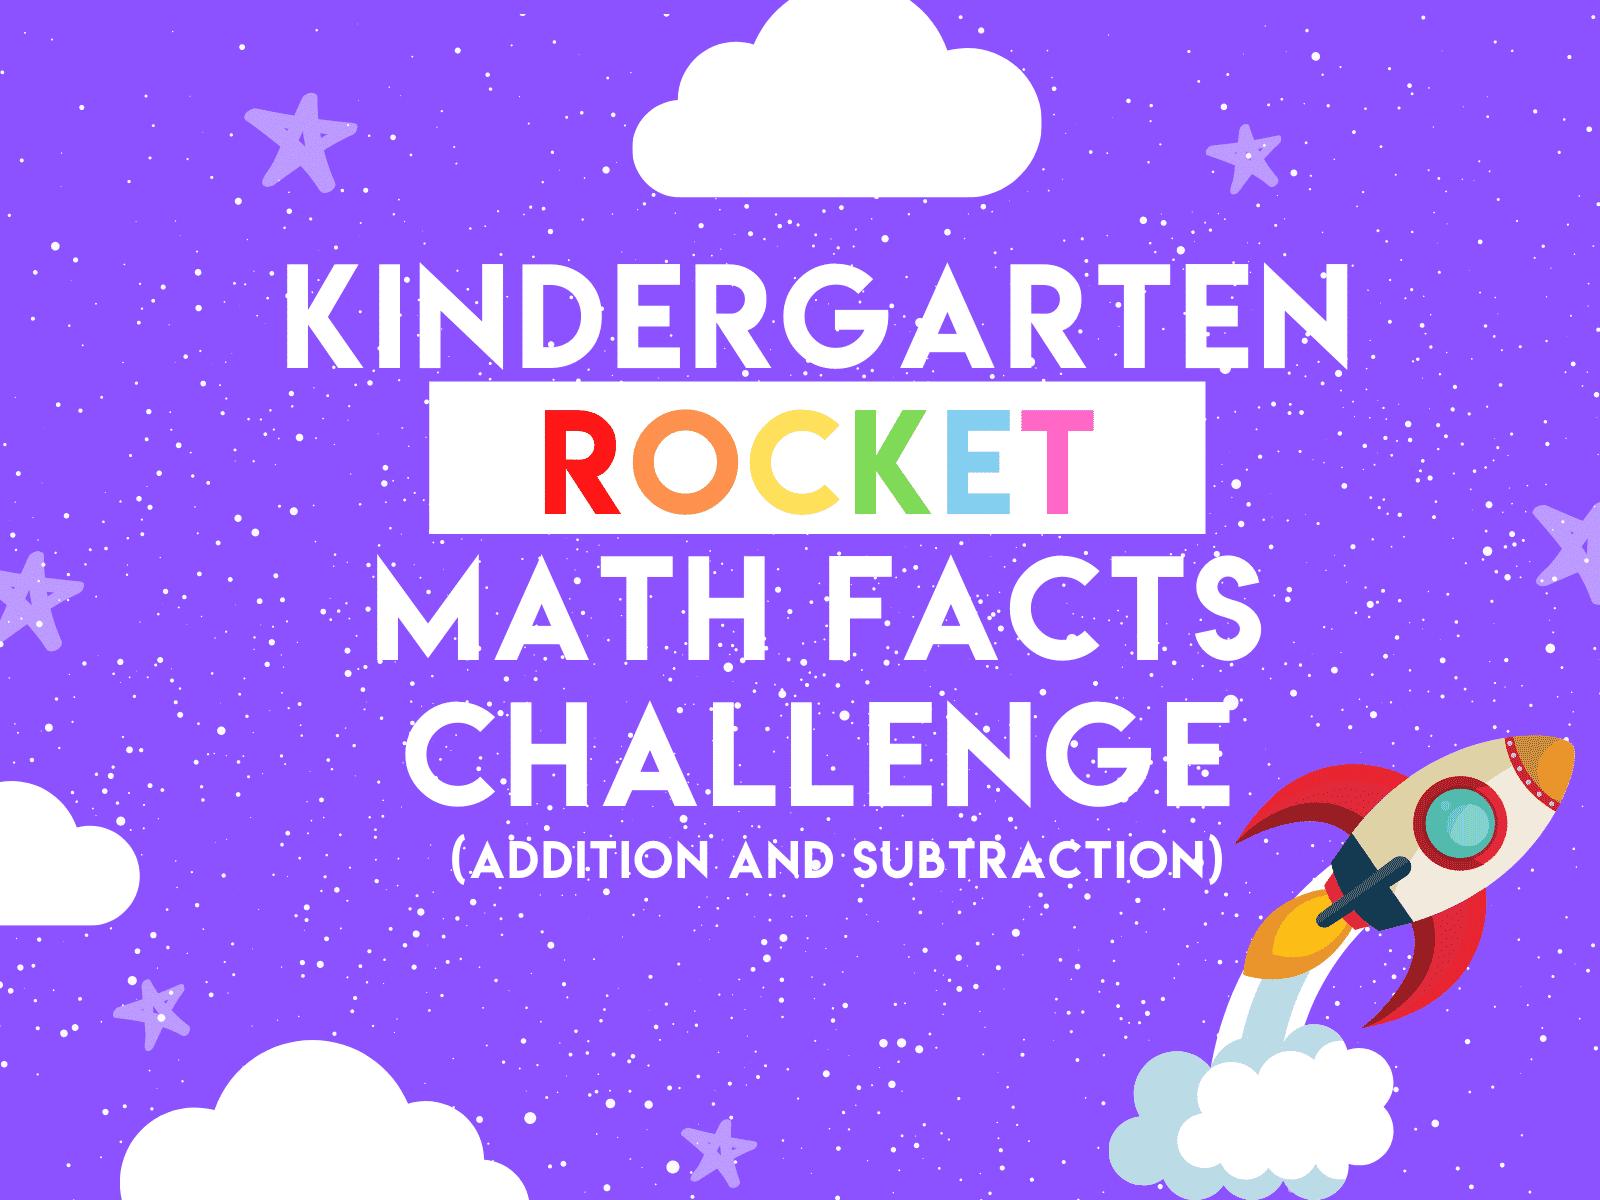 Kindergarten Rocket Math Challenge | Addition and subtraction learning resource for kids